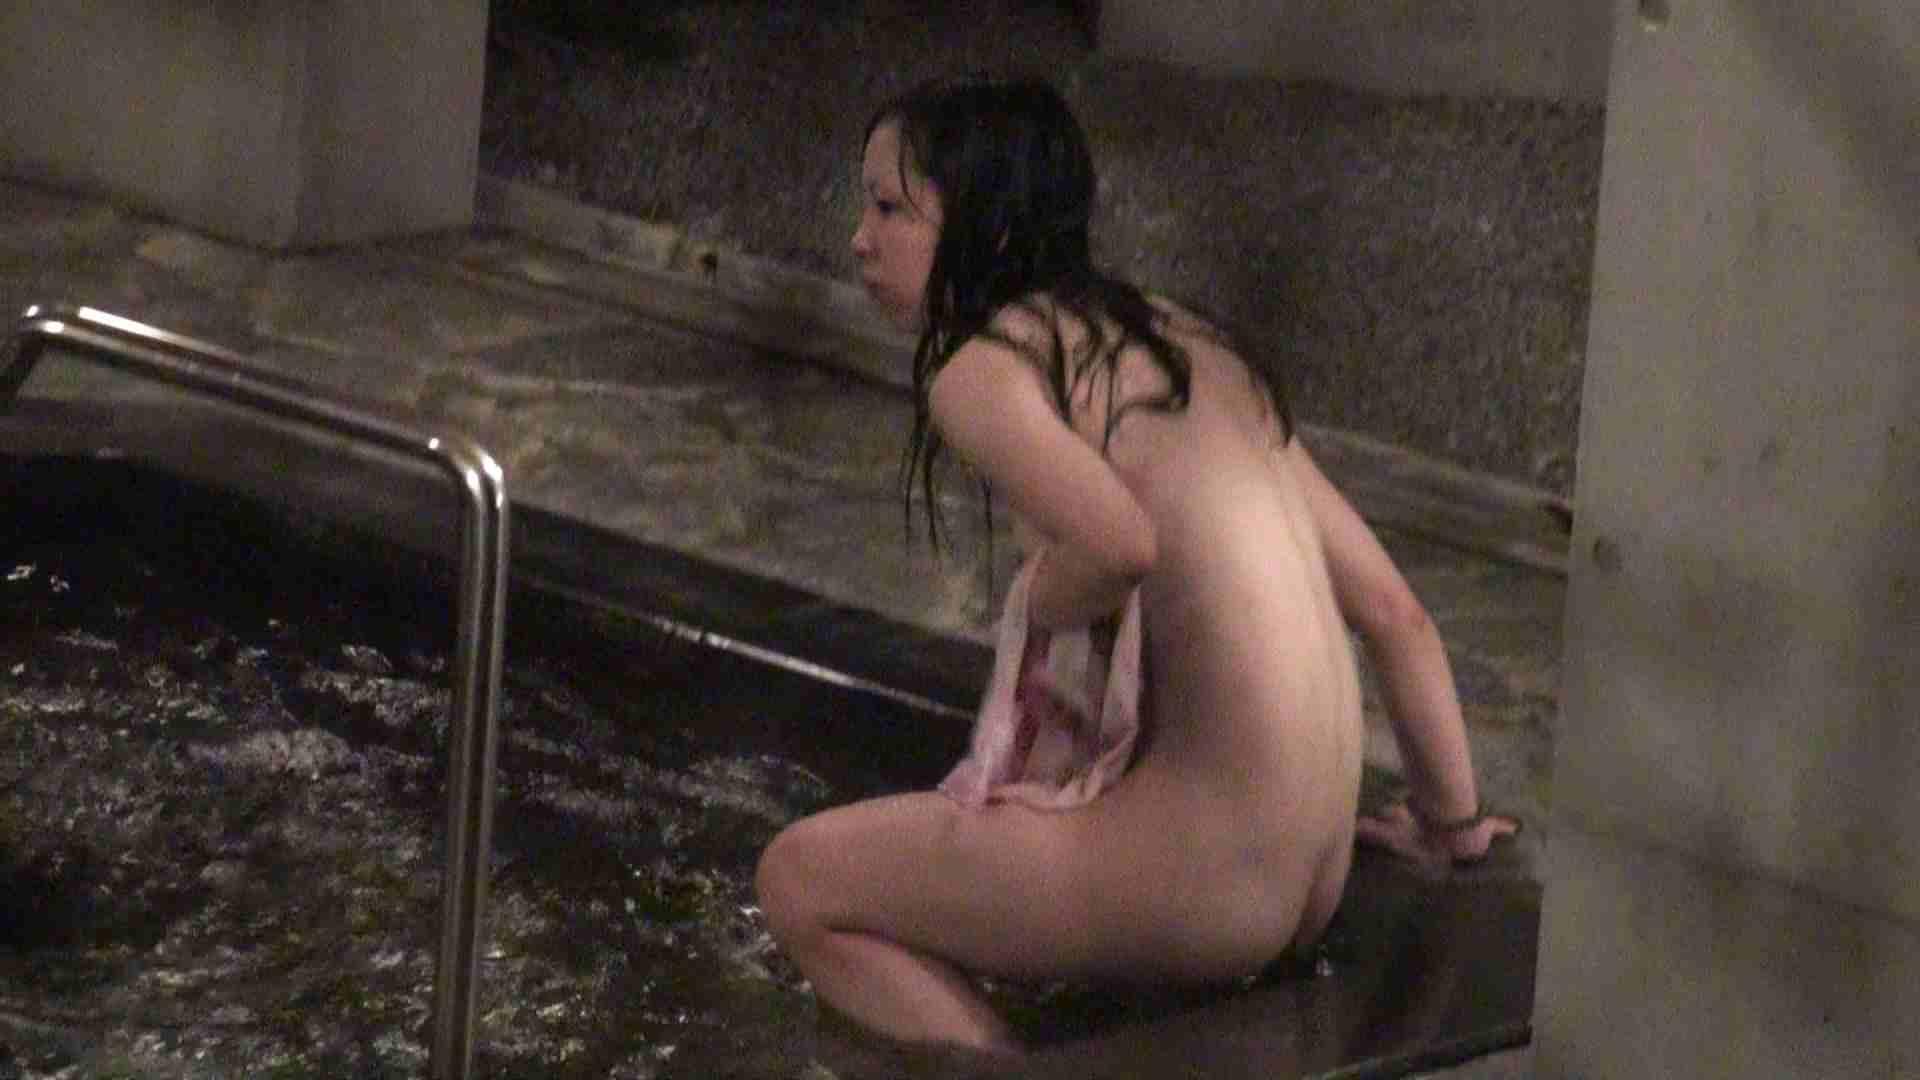 Aquaな露天風呂Vol.381 盗撮師作品  97pic 27